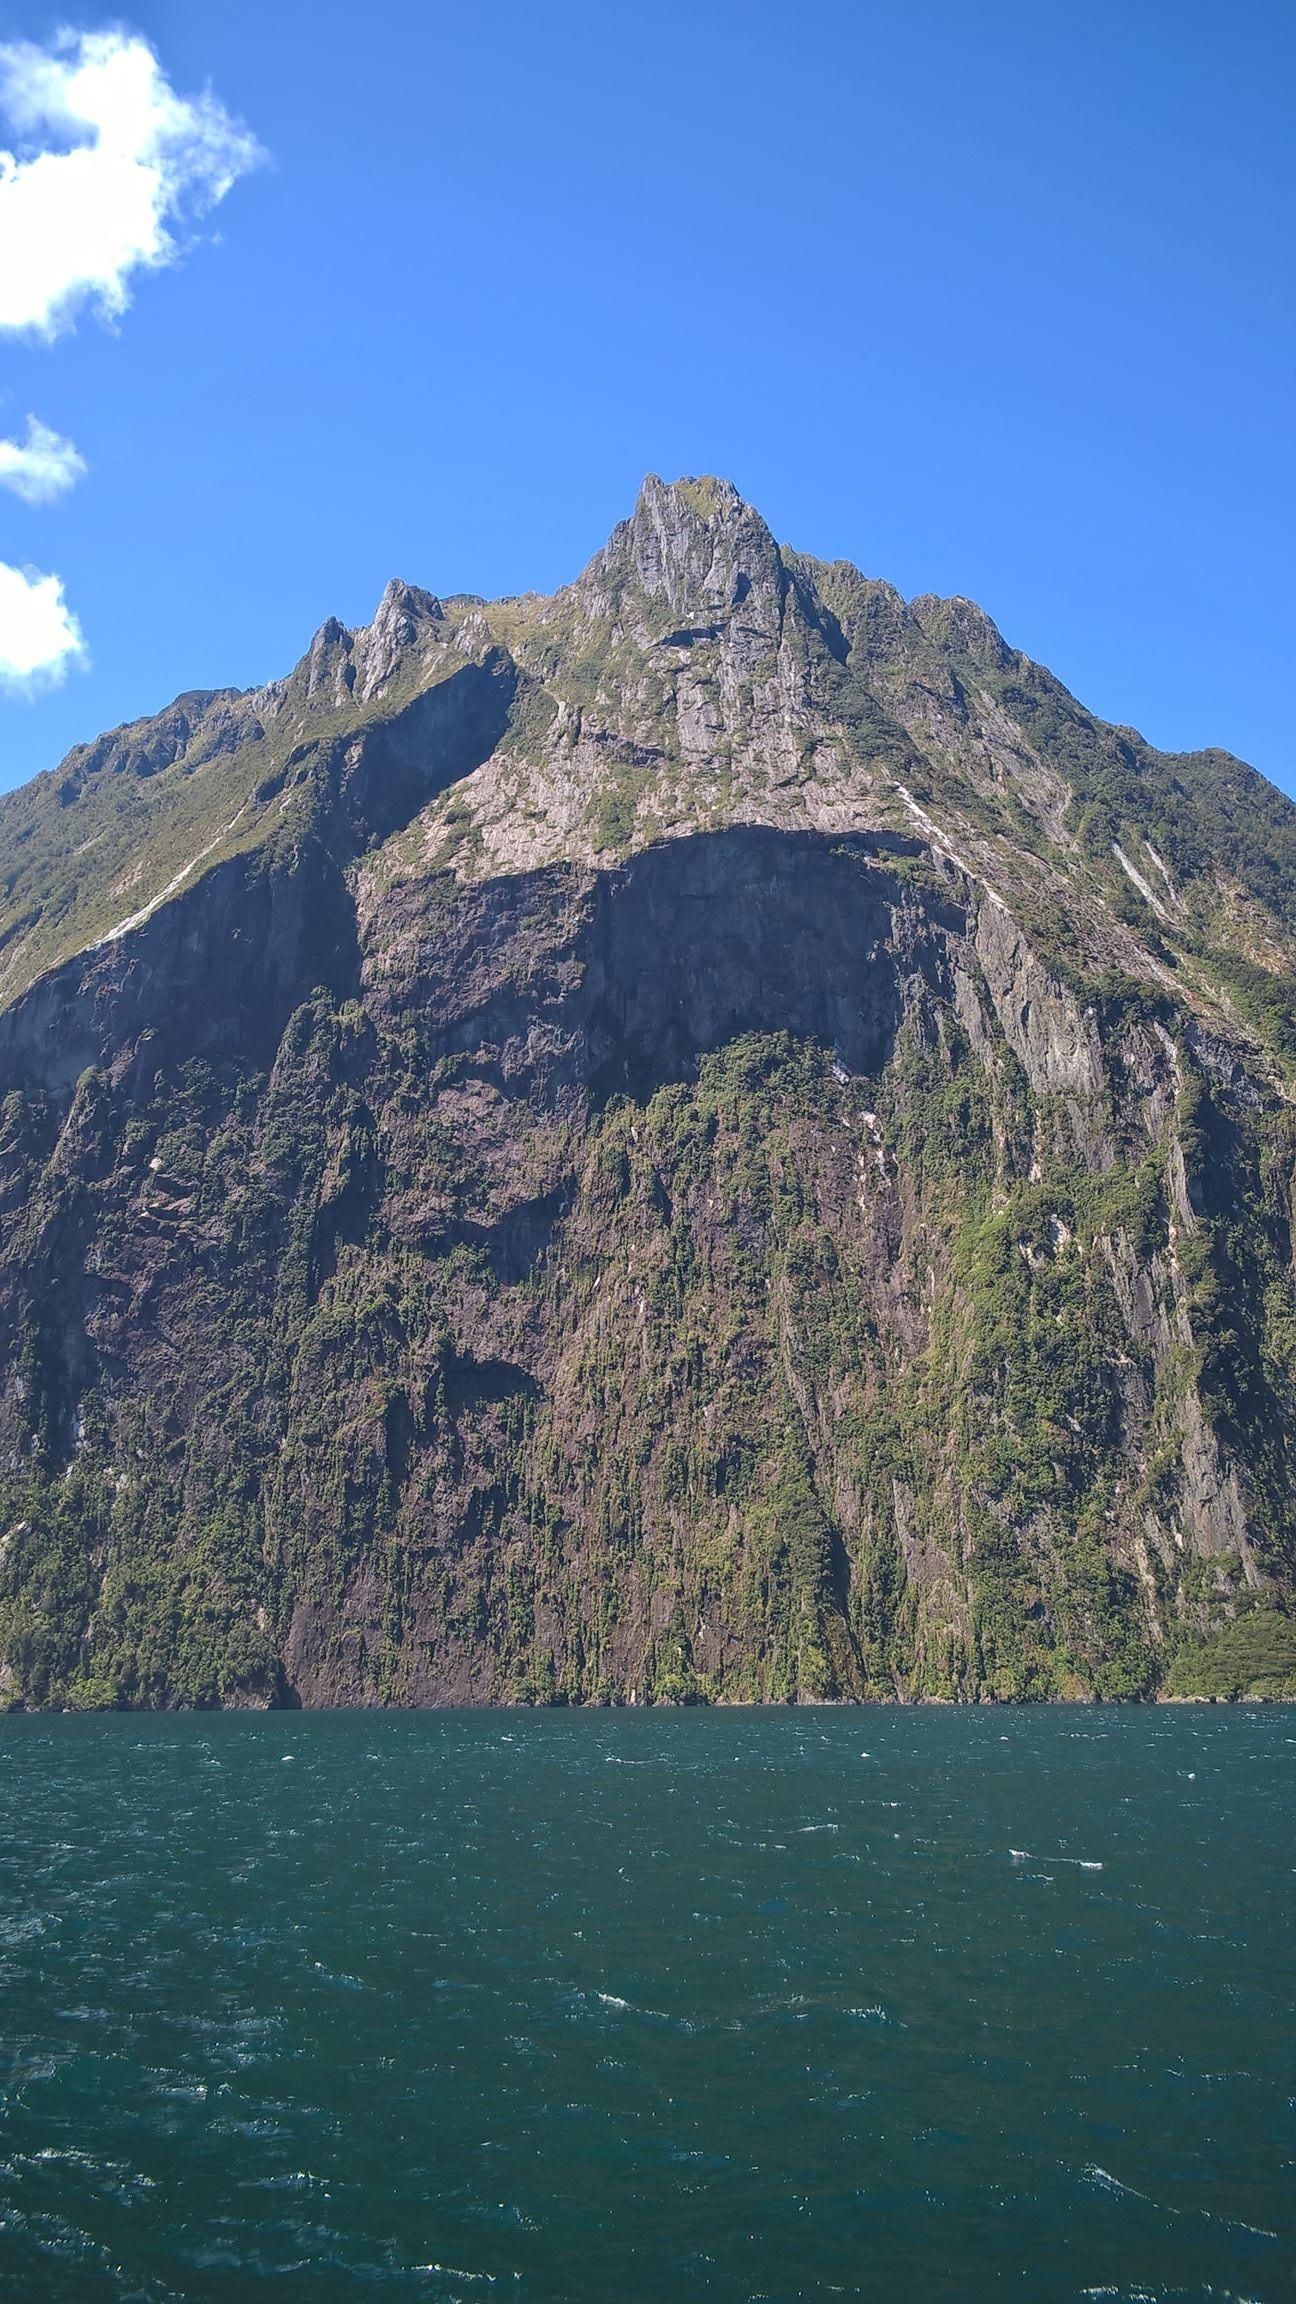 Beeindruckende Berge